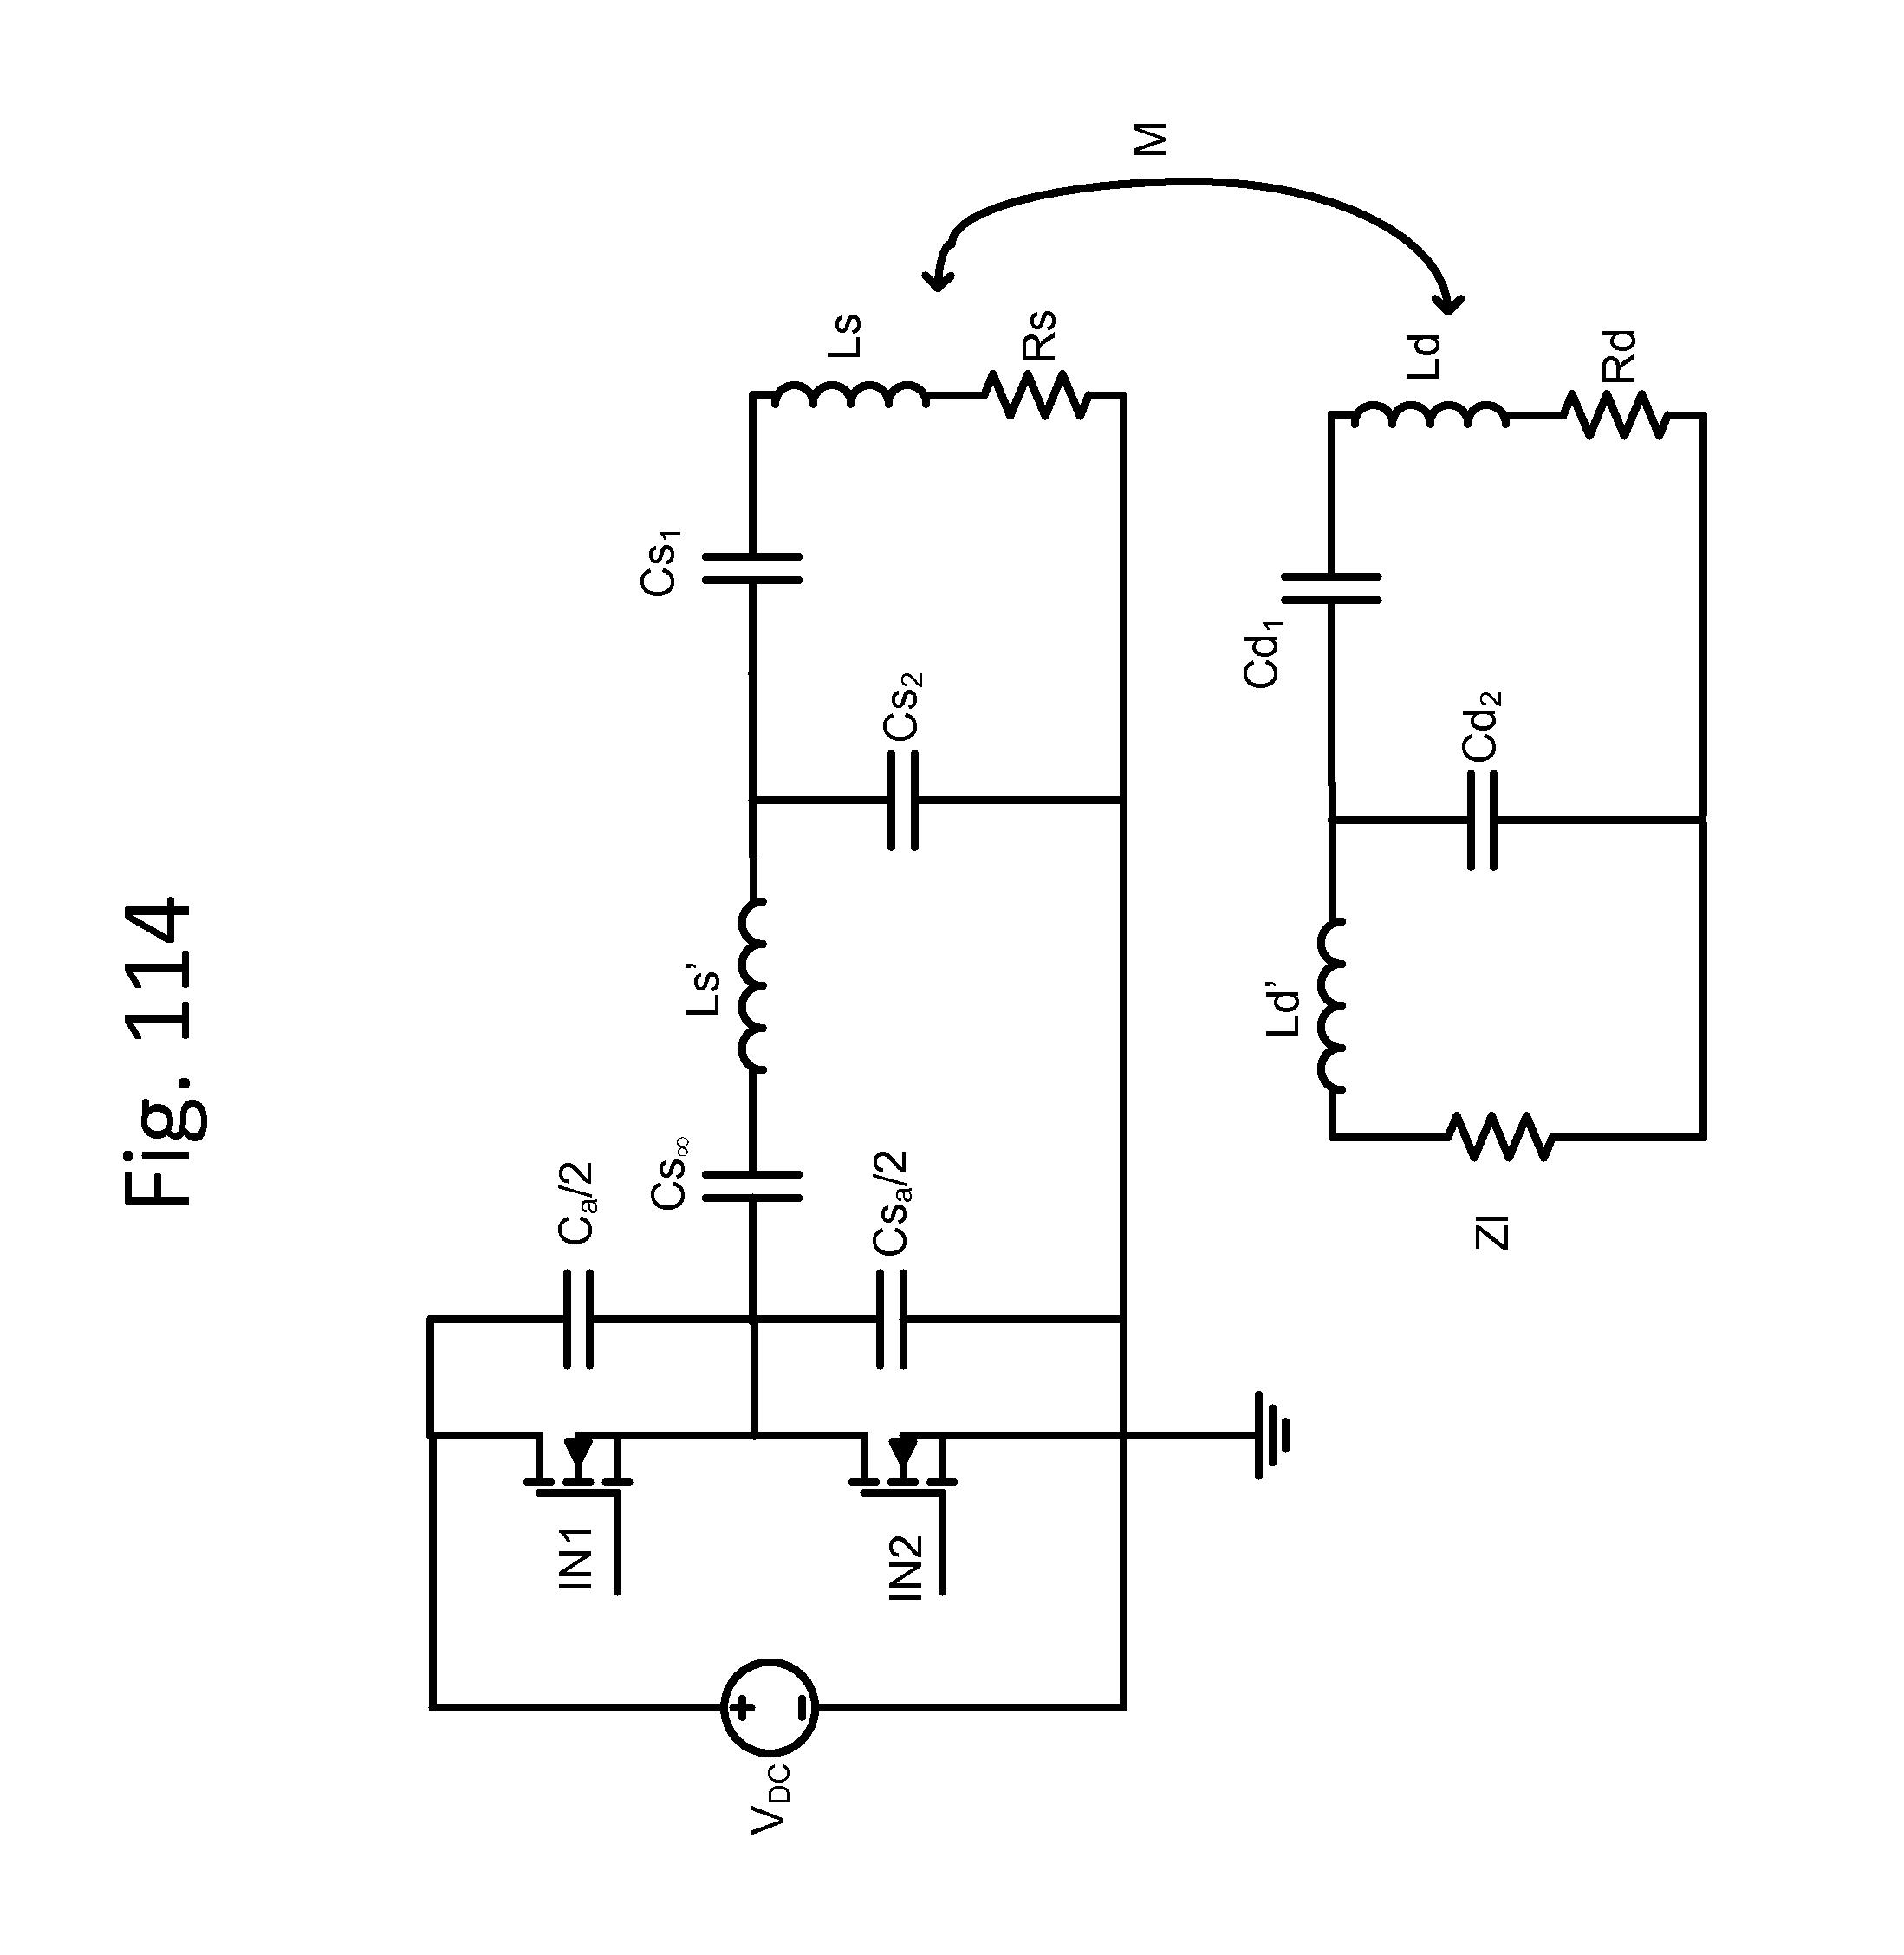 Wiring Diagrams Online Work Rack Visio Stencil Bmw 2002 Wiring Diagram